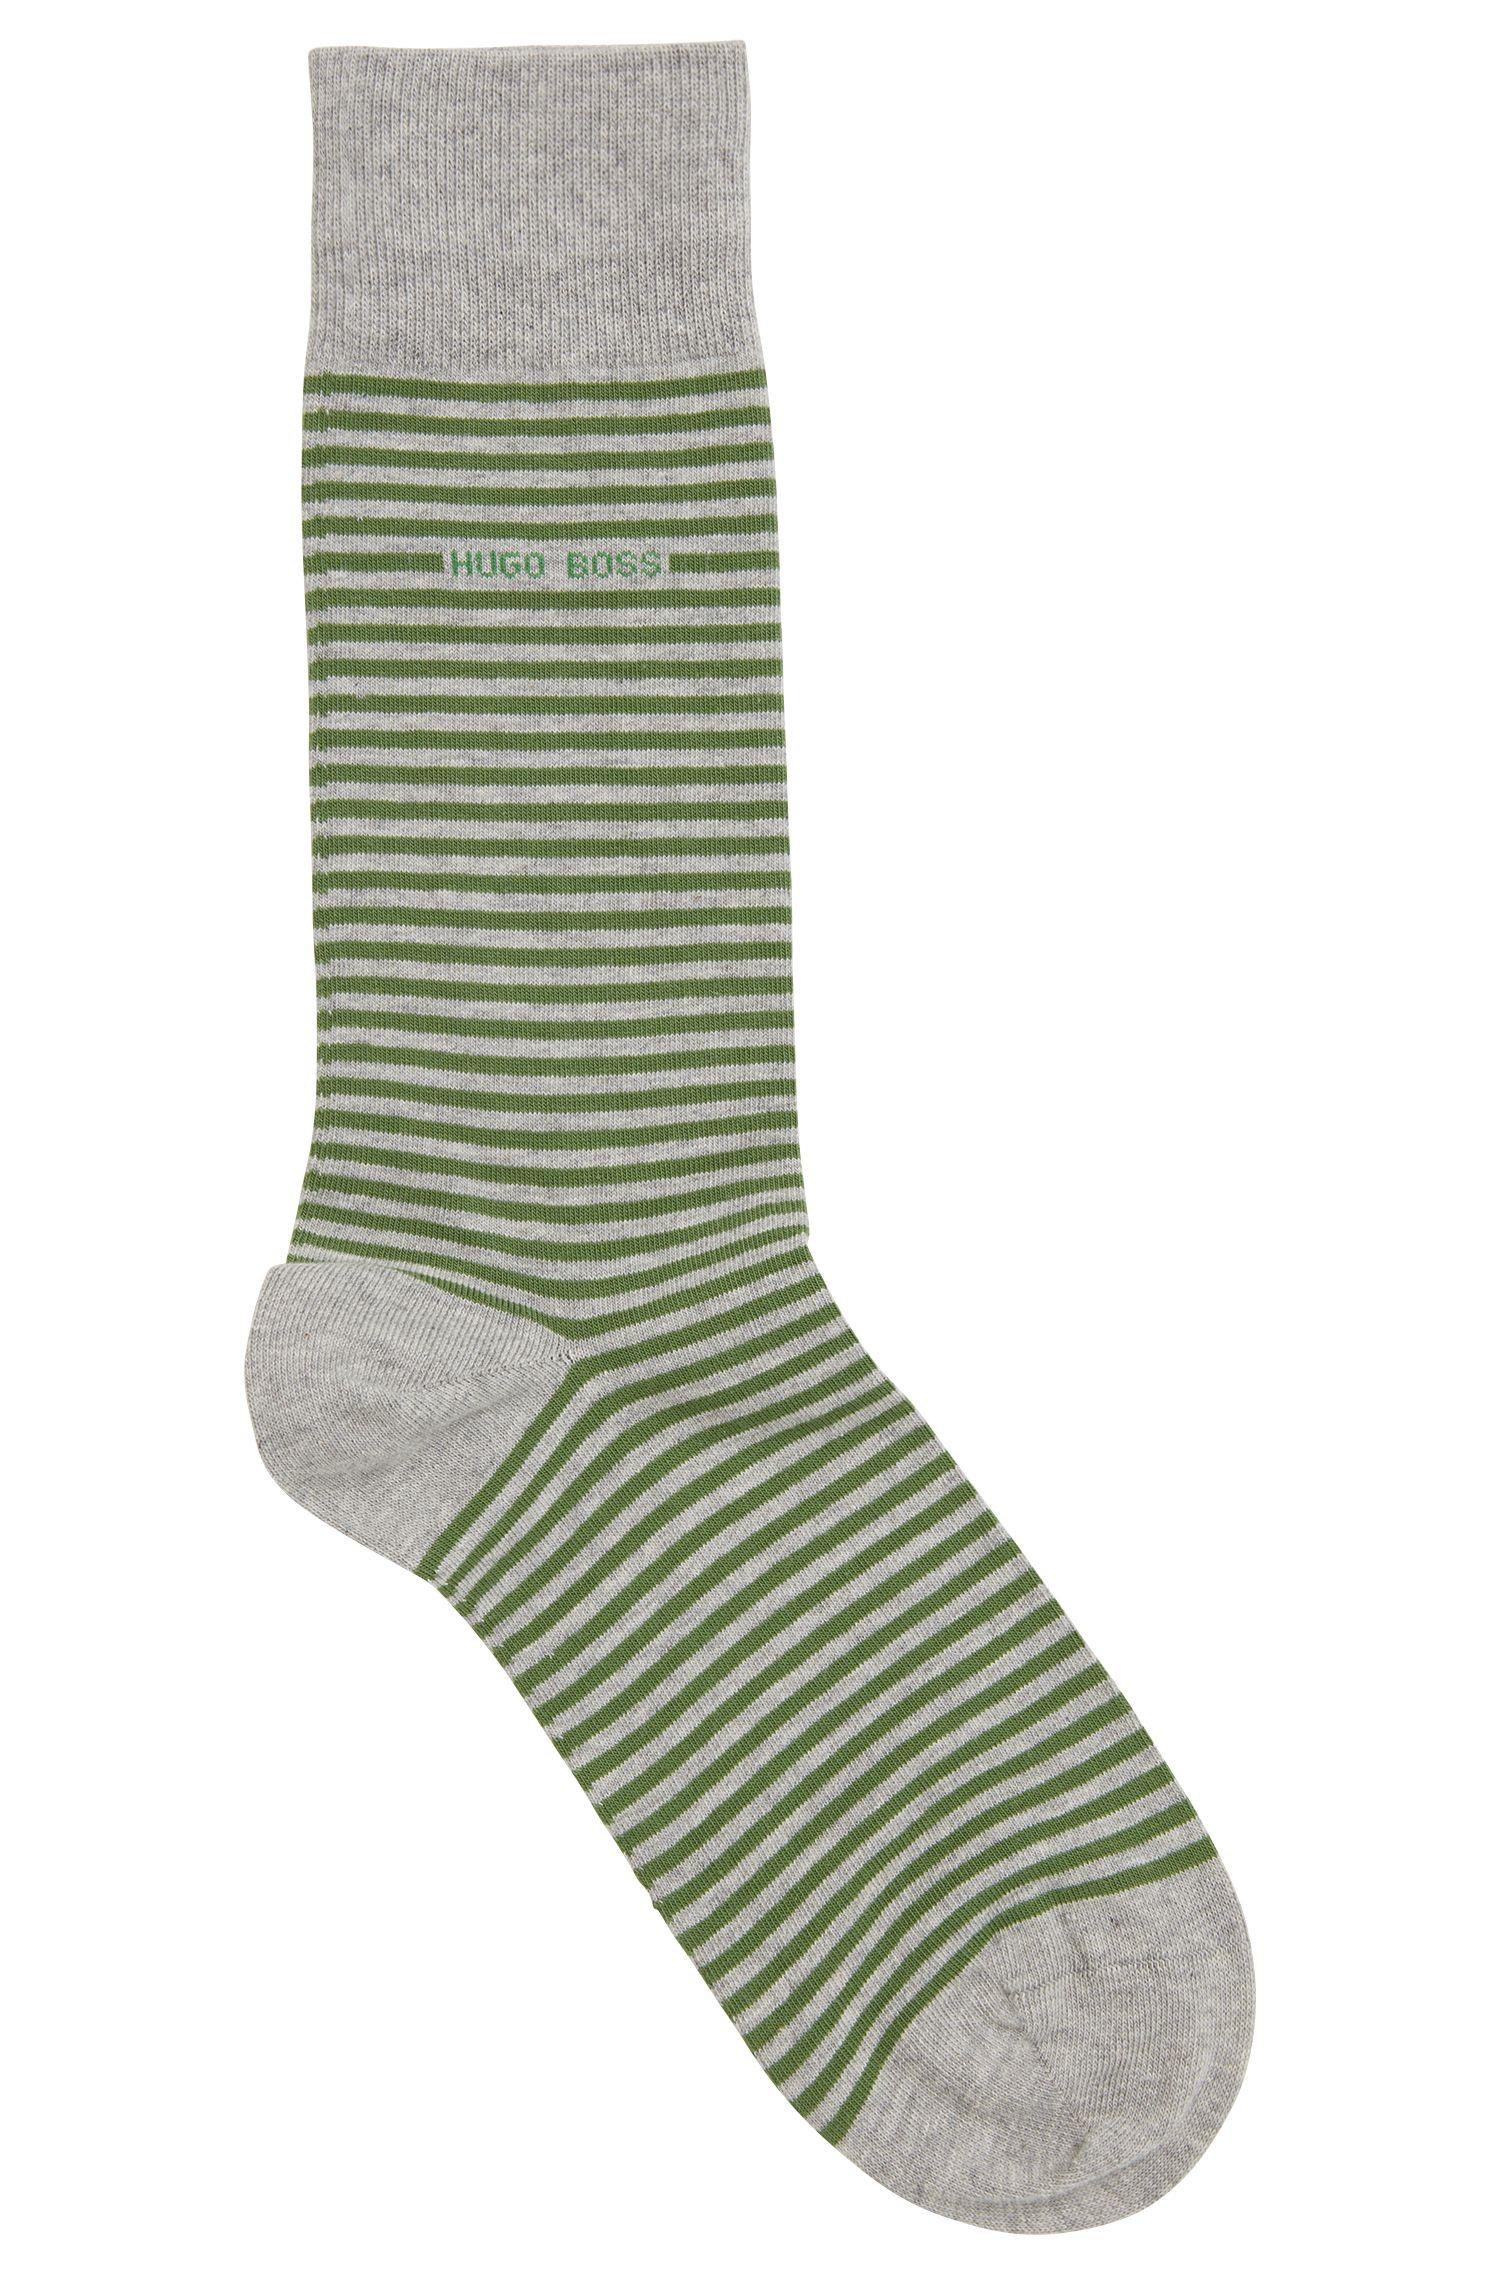 Striped Stretch Cotton Sock | Marc RS Stripe US